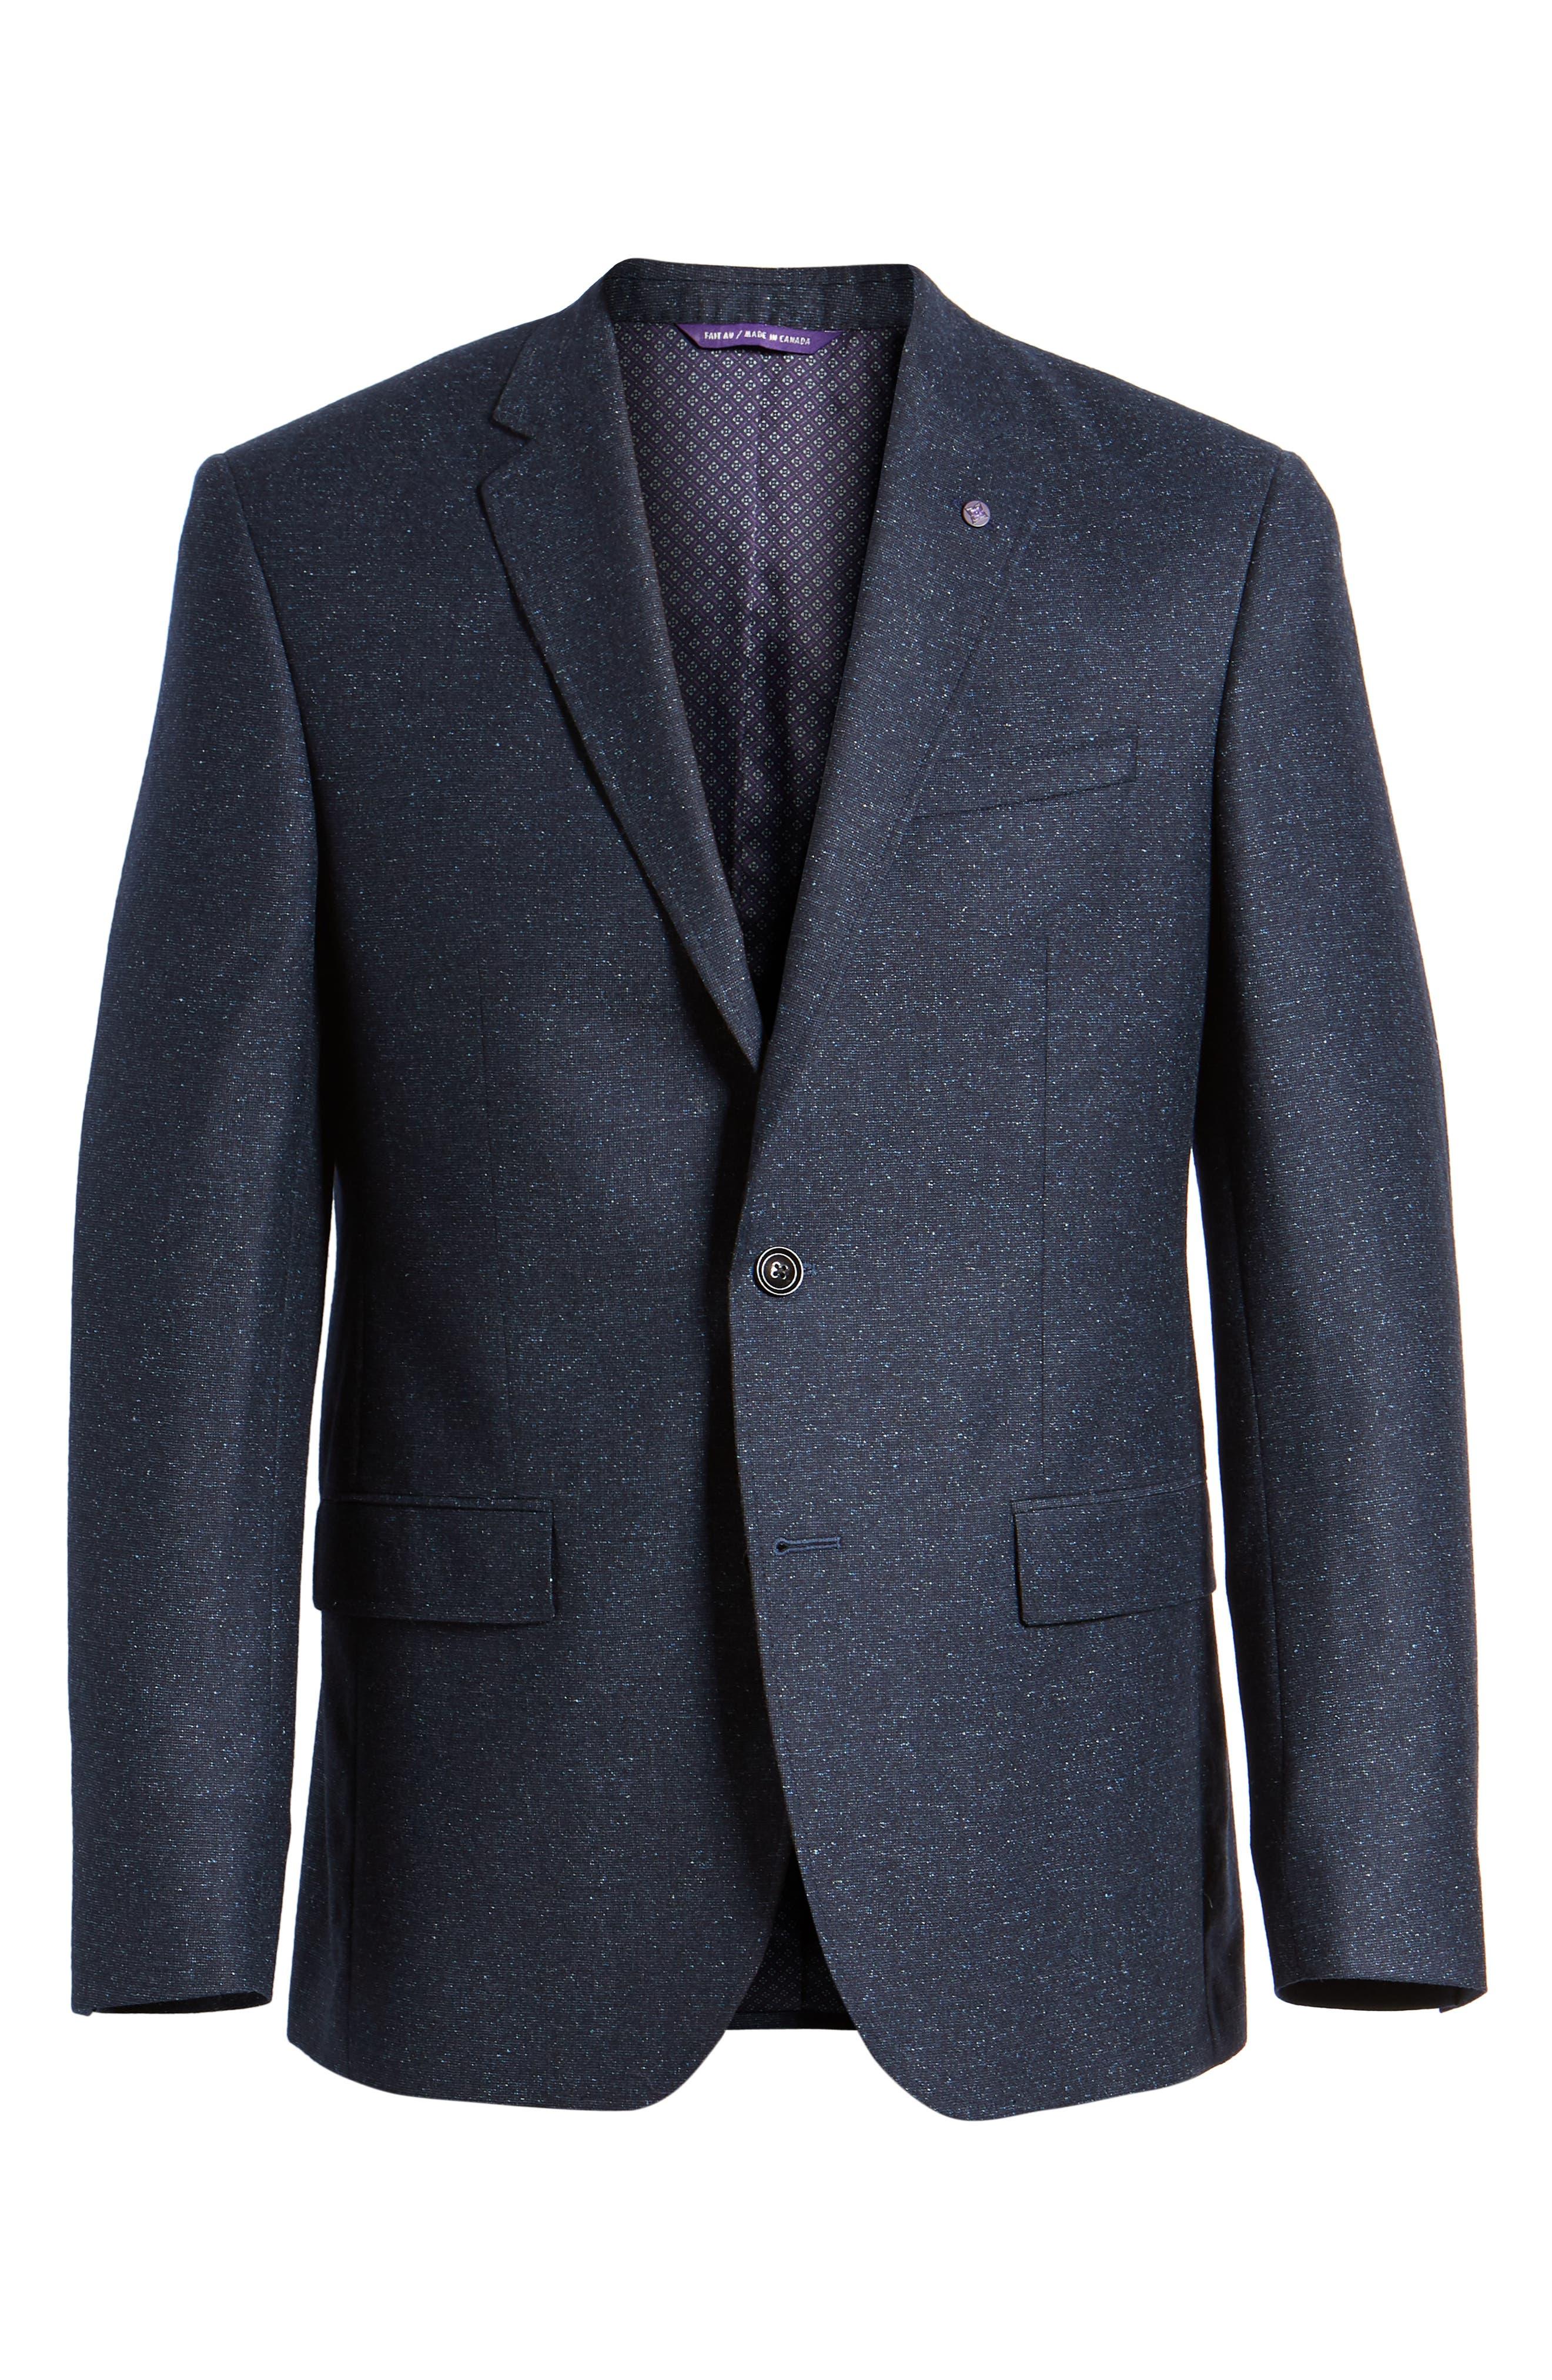 Jay Trim Fit Tweed Wool & Silk Sport Coat,                             Alternate thumbnail 6, color,                             Blue